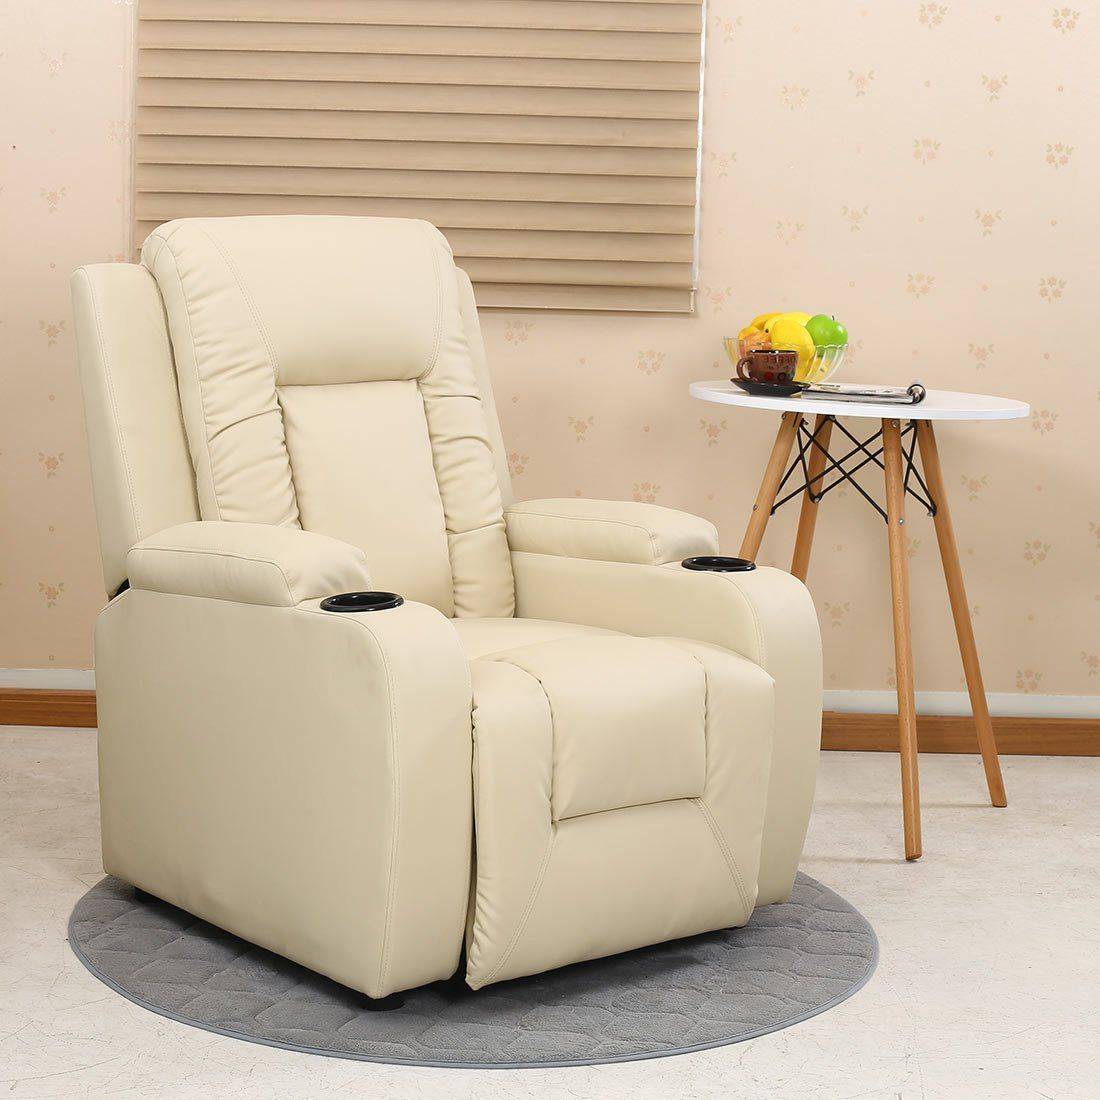 oscar leather recliner w drink holders armchair sofa chair reclining rh pinterest com